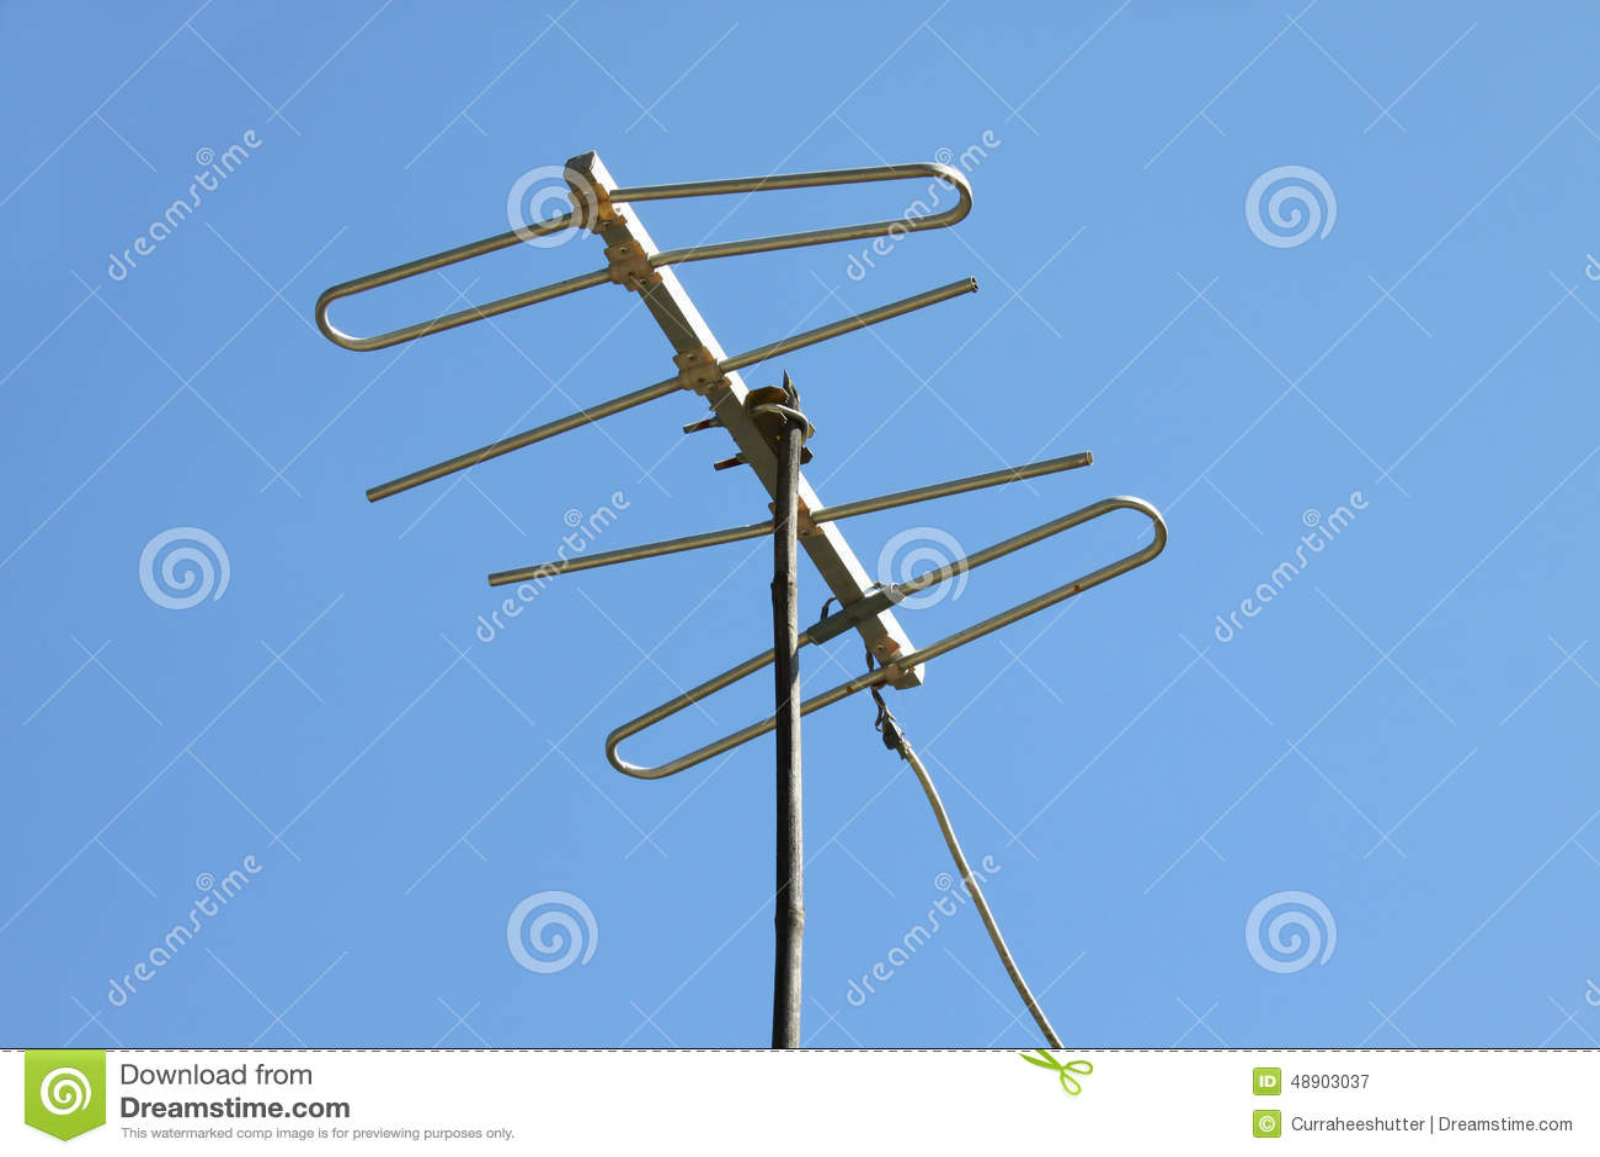 Tv Roof Antenna Diagram - Wiring Diagram •